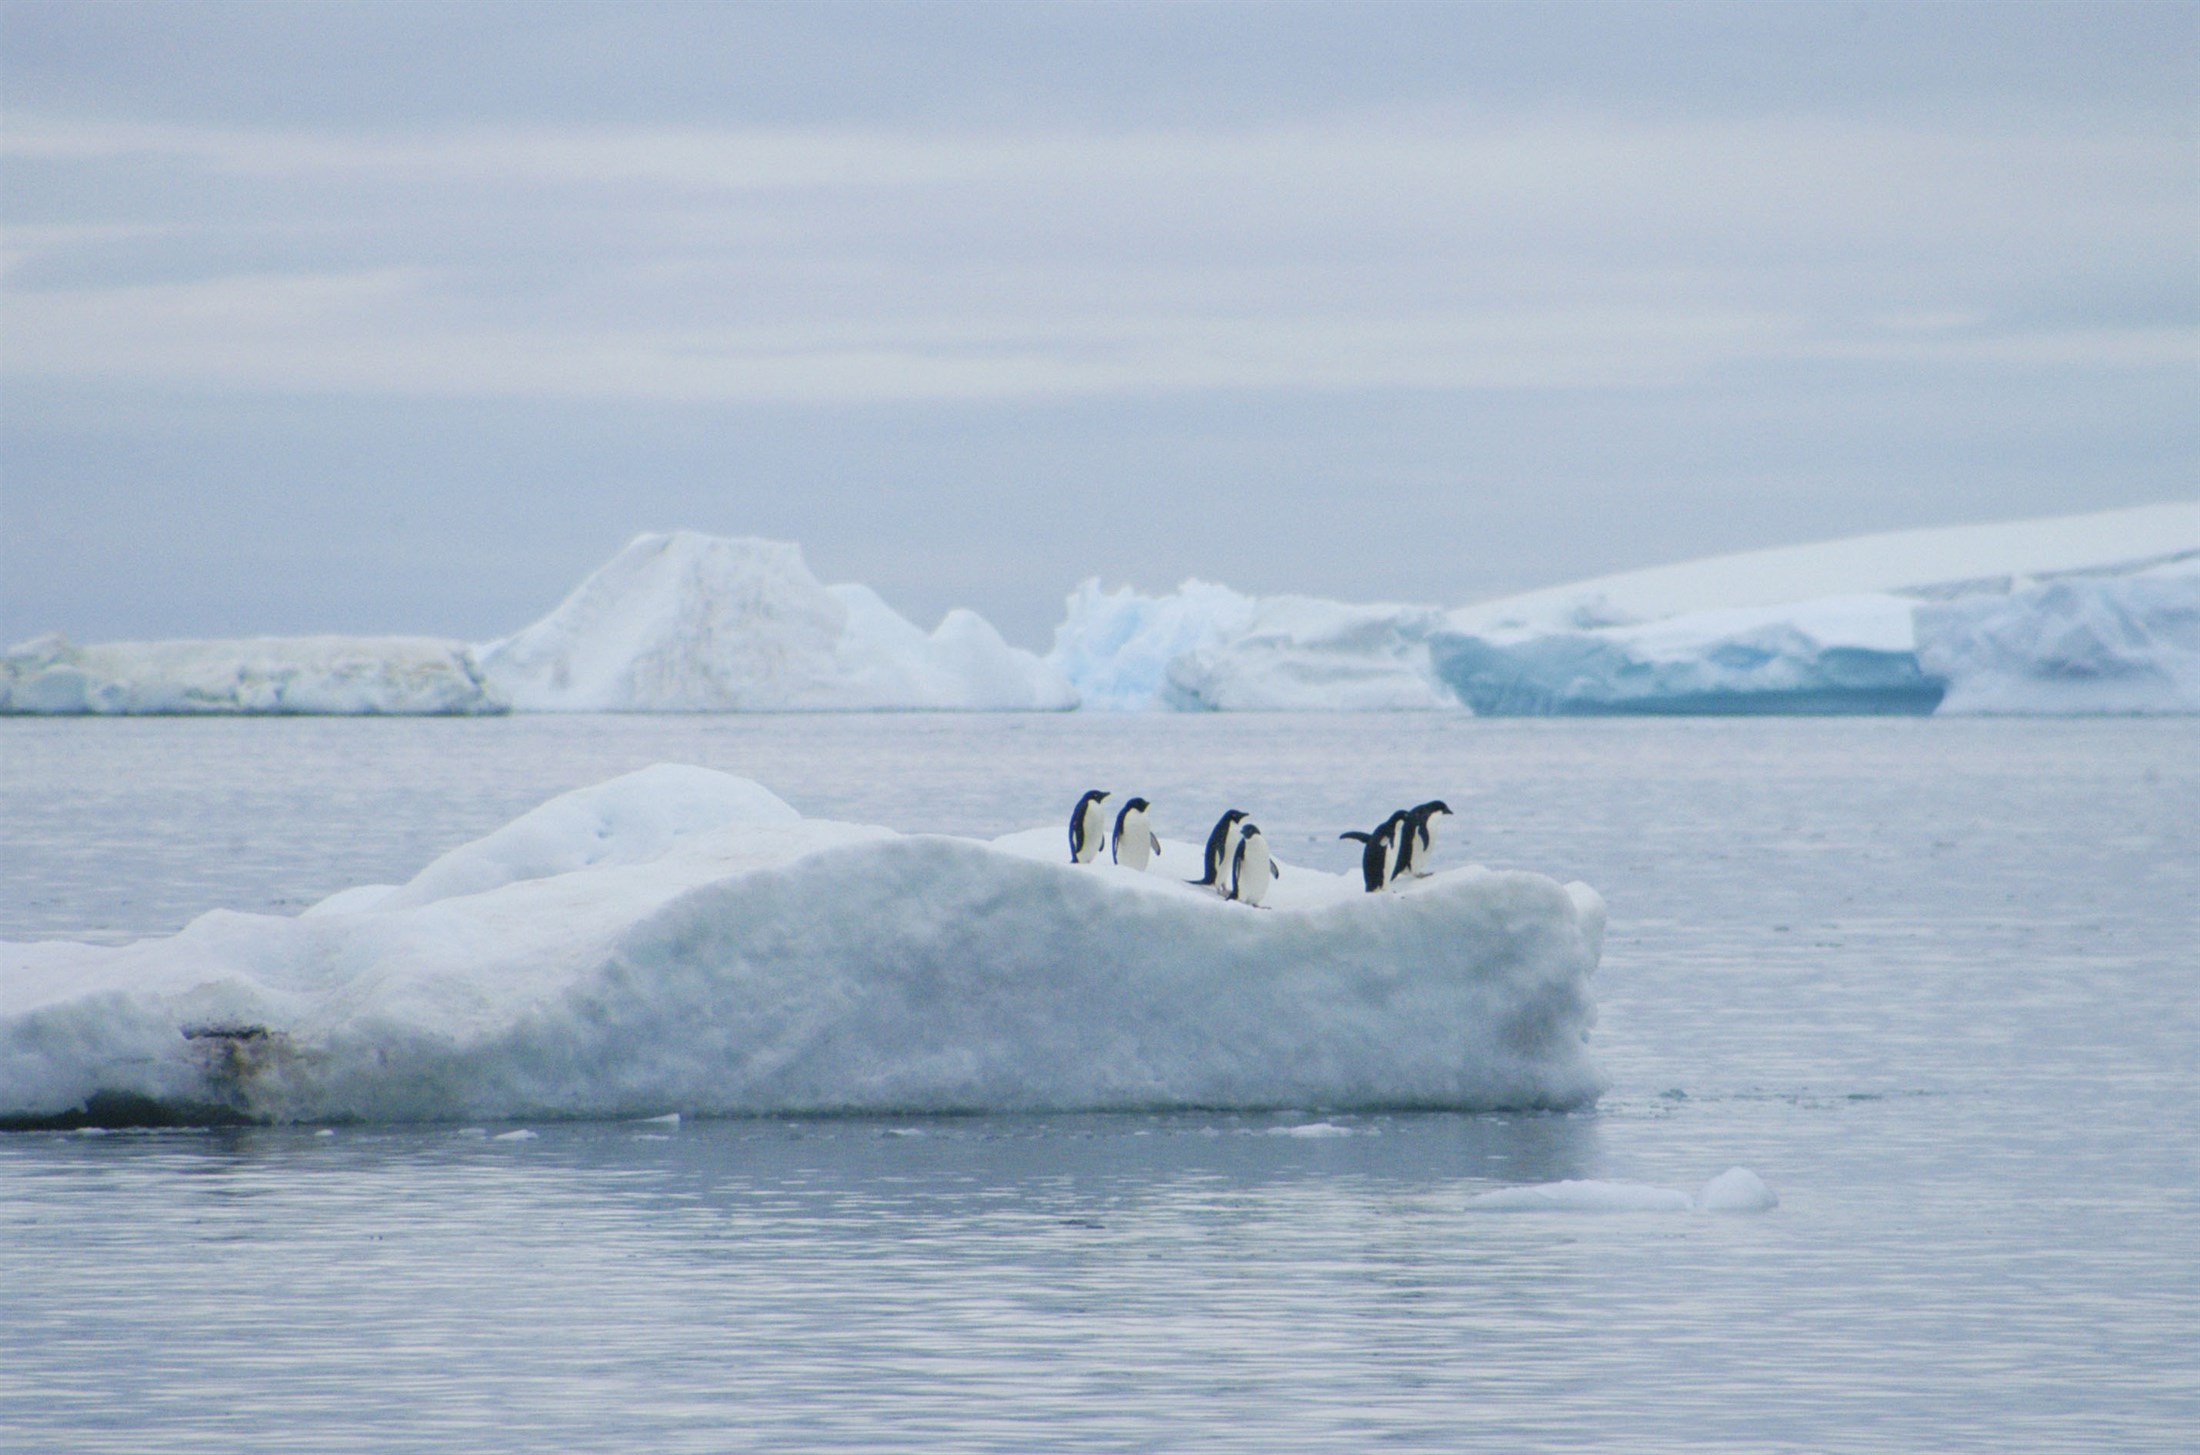 glacier-ice-and-sea-ice-adelie-penguinsantarctic-peninsula_61fb-2200x1455px